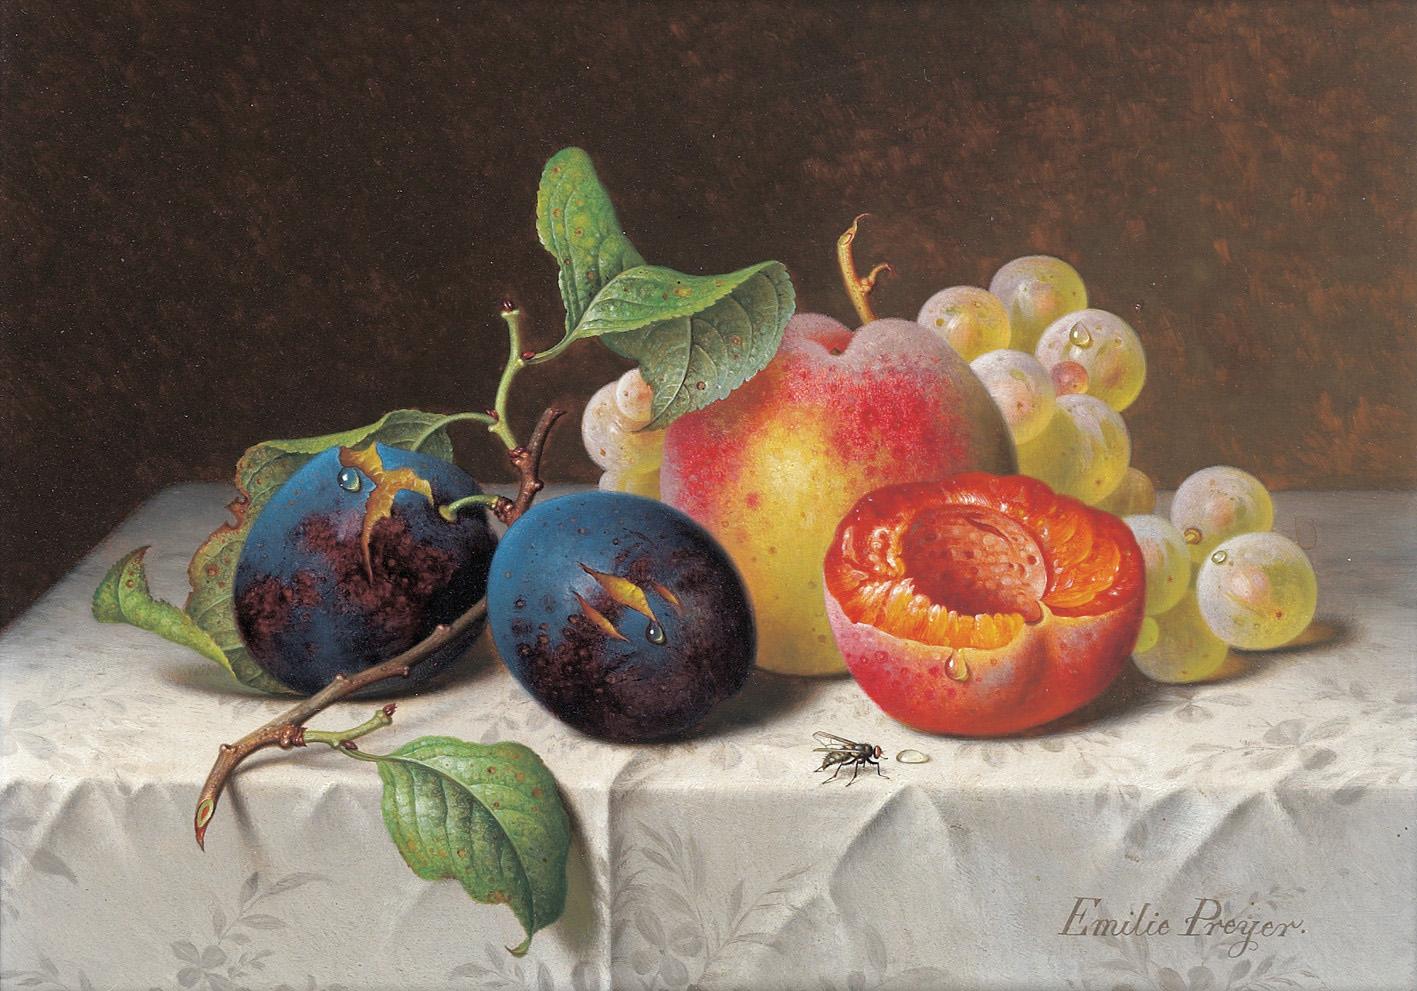 File:Preyer, Emilie - Still Life of Fruit.jpg - Wikimedia ...